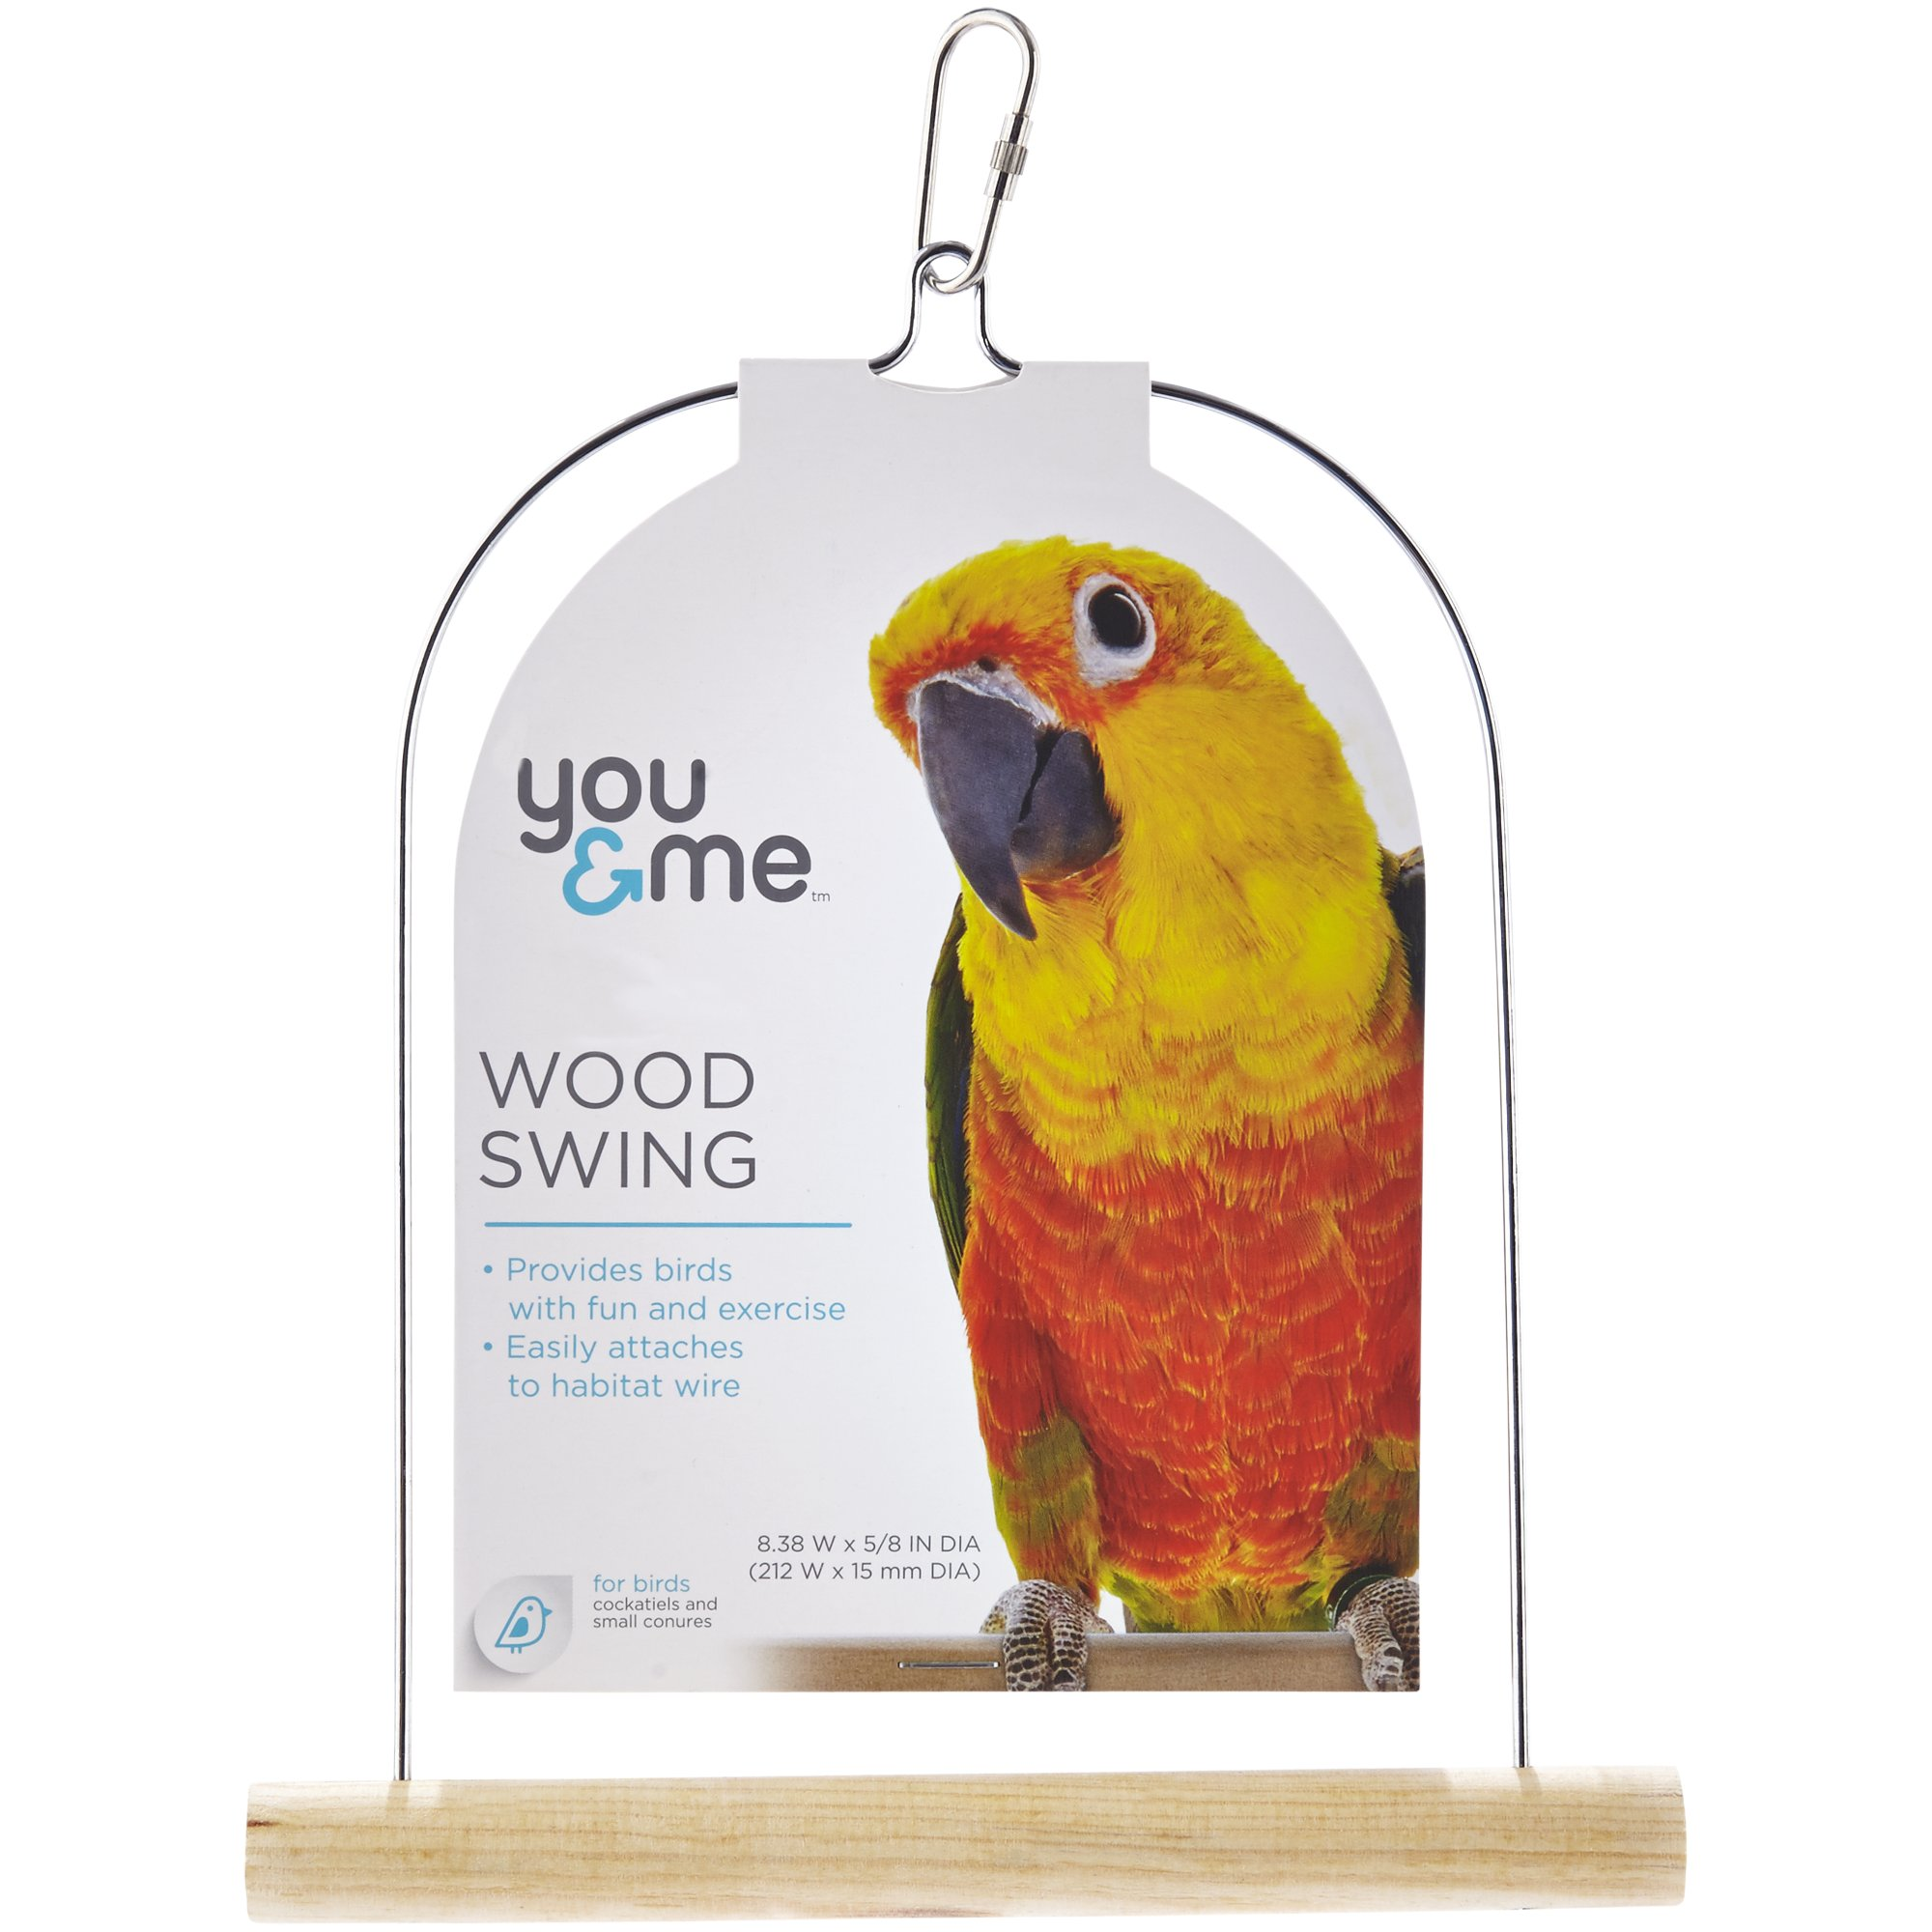 You me wood bird swing petco for Feeder fish petco